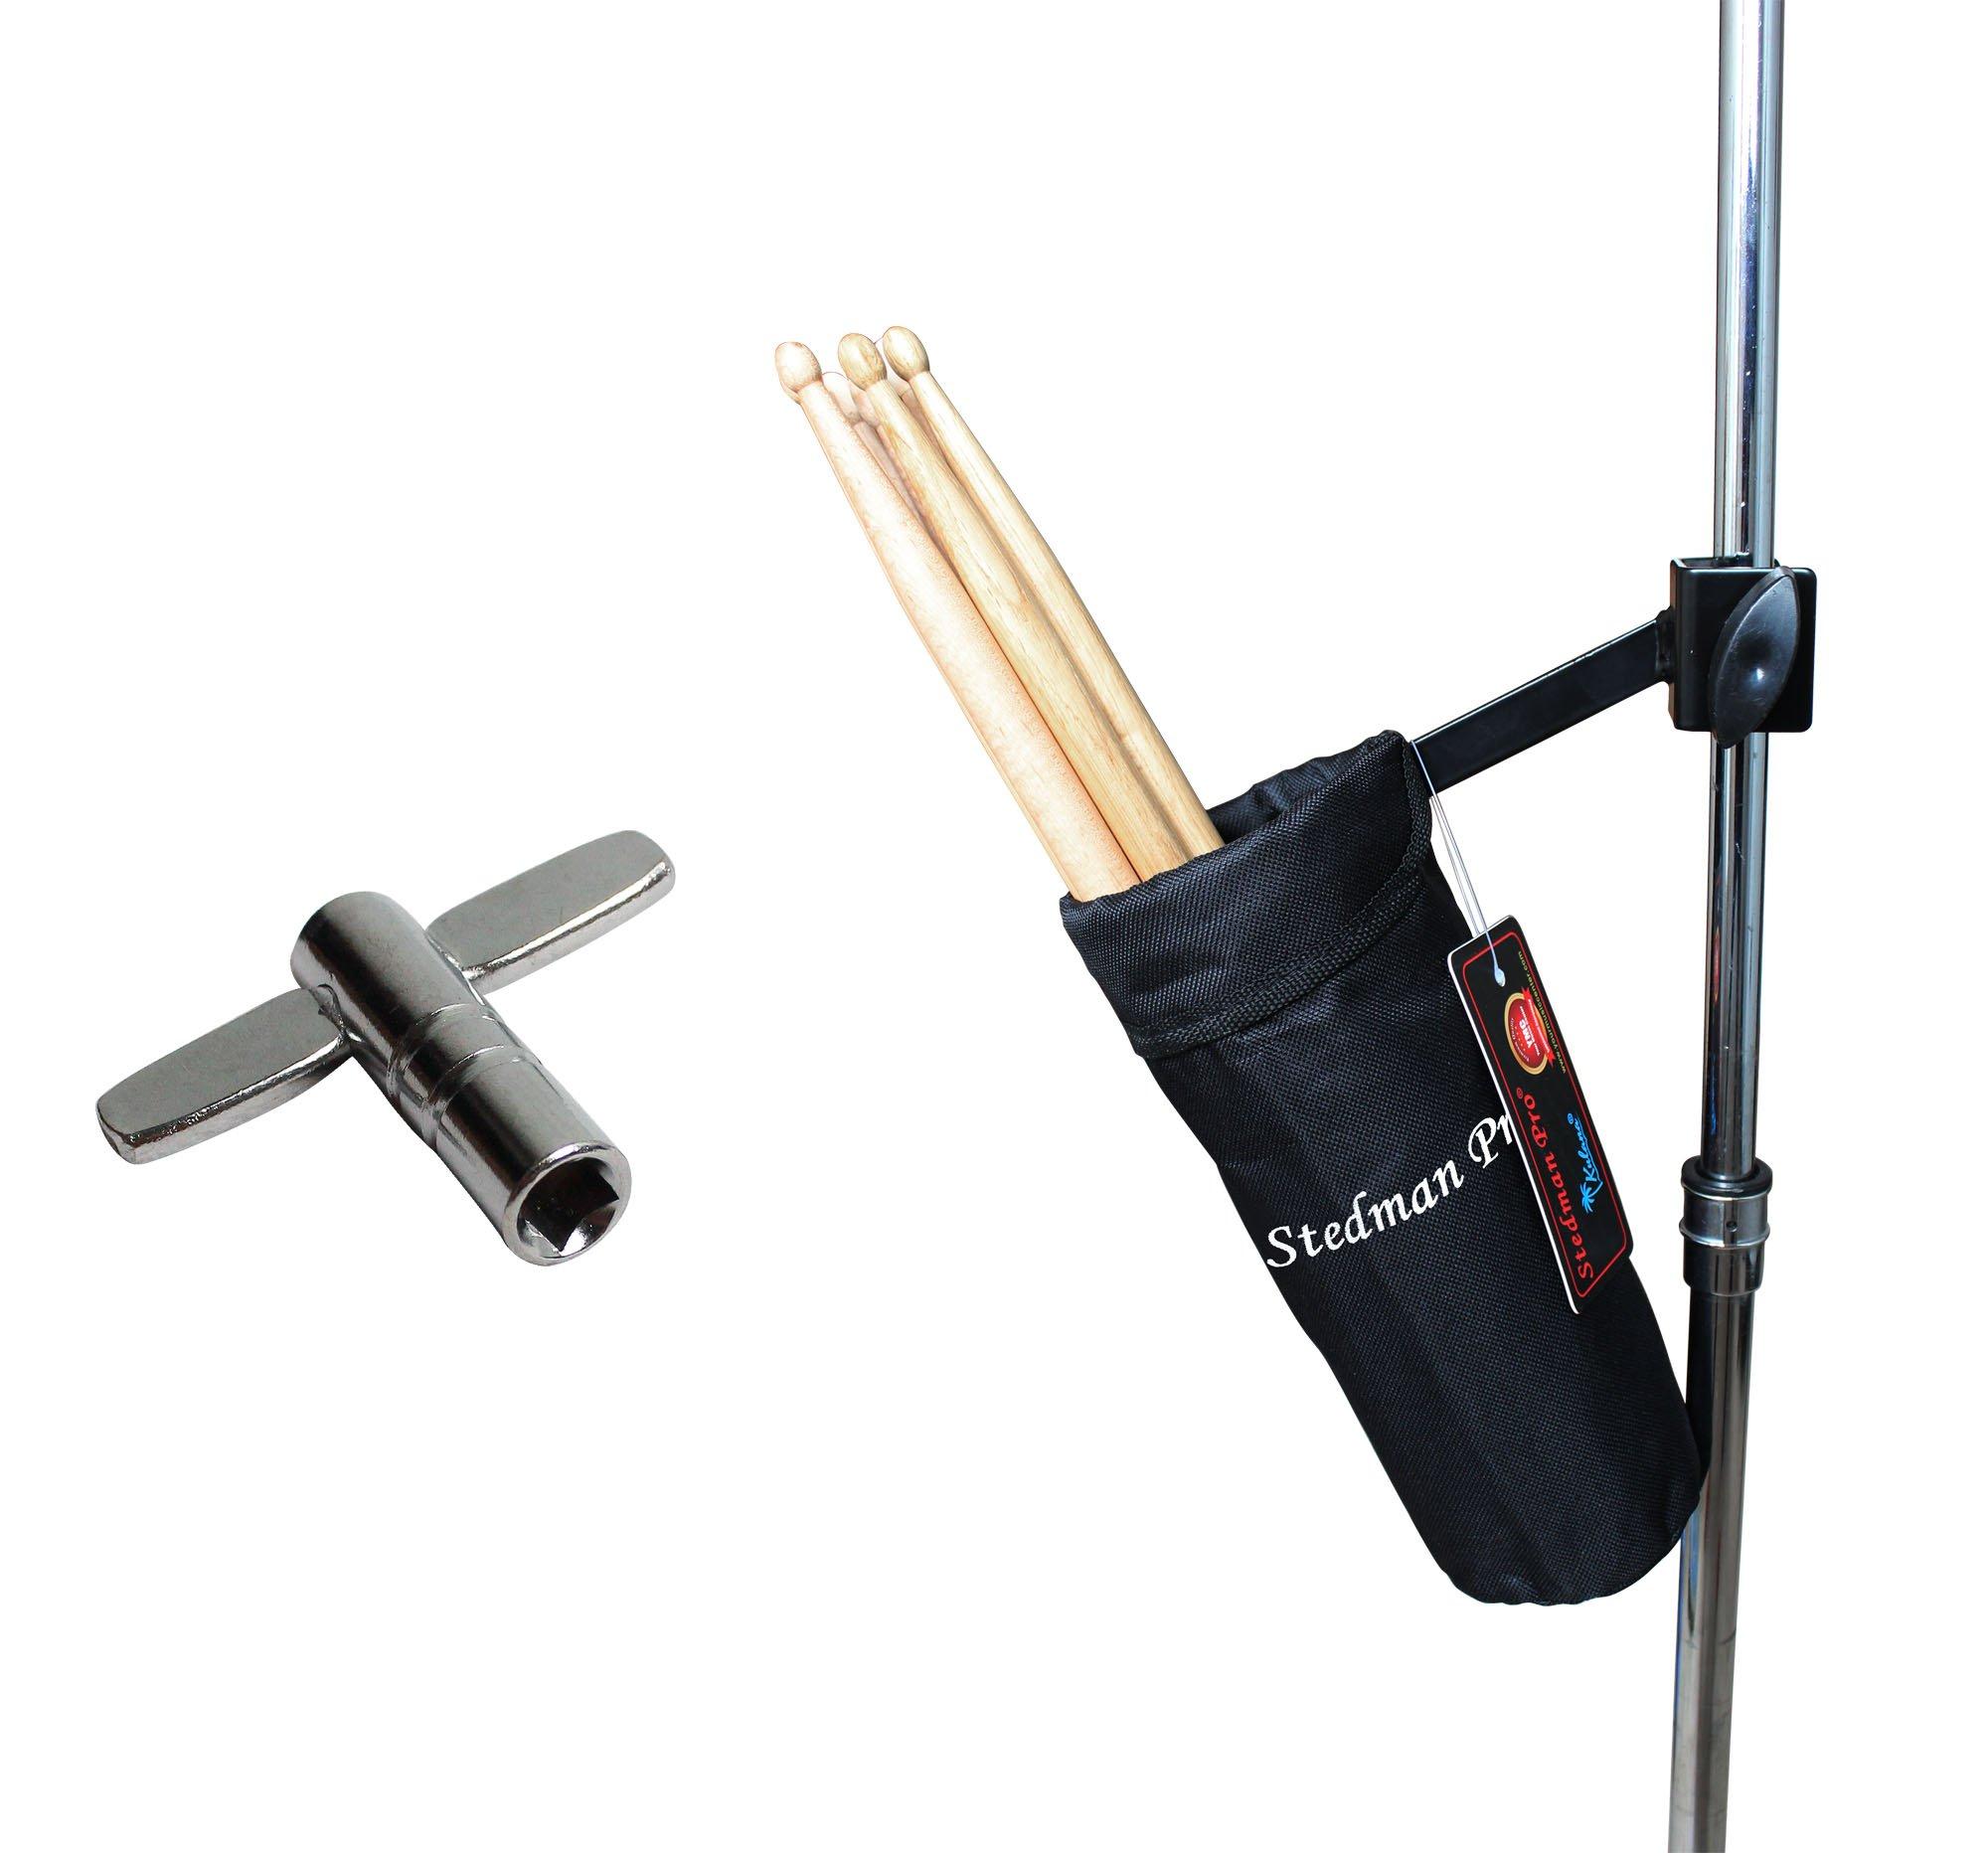 Vizcaya DSH10 Drum Stick Holder Drum Stick Bag with Drum Key (Black)